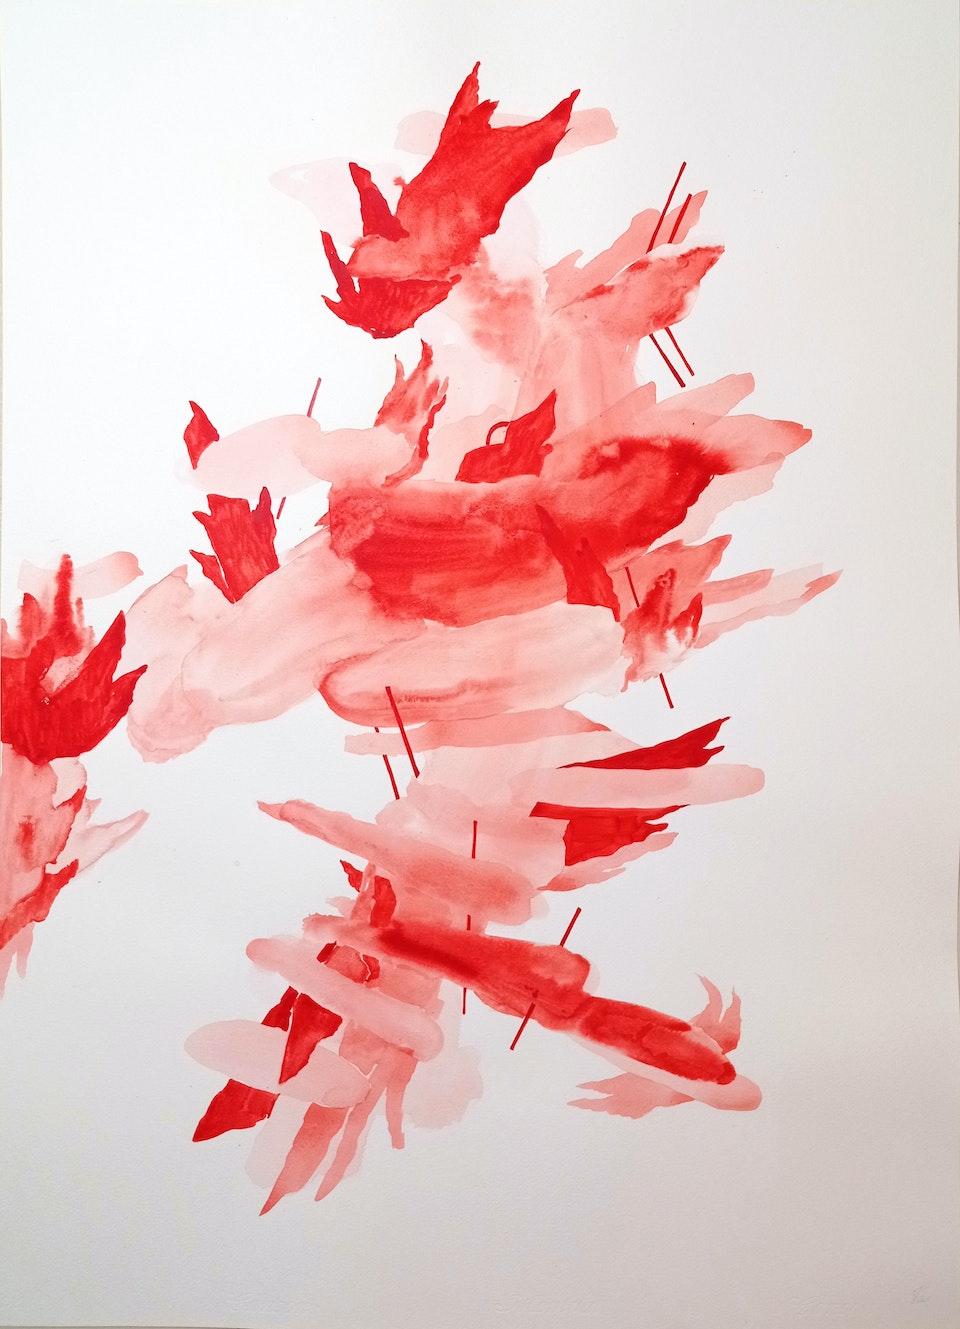 Blaze V_2021_Justin Southey - Justin Southey 2021 Blaze V Acrylic ink on paper 75cm x 55cm  ZAR 20 500